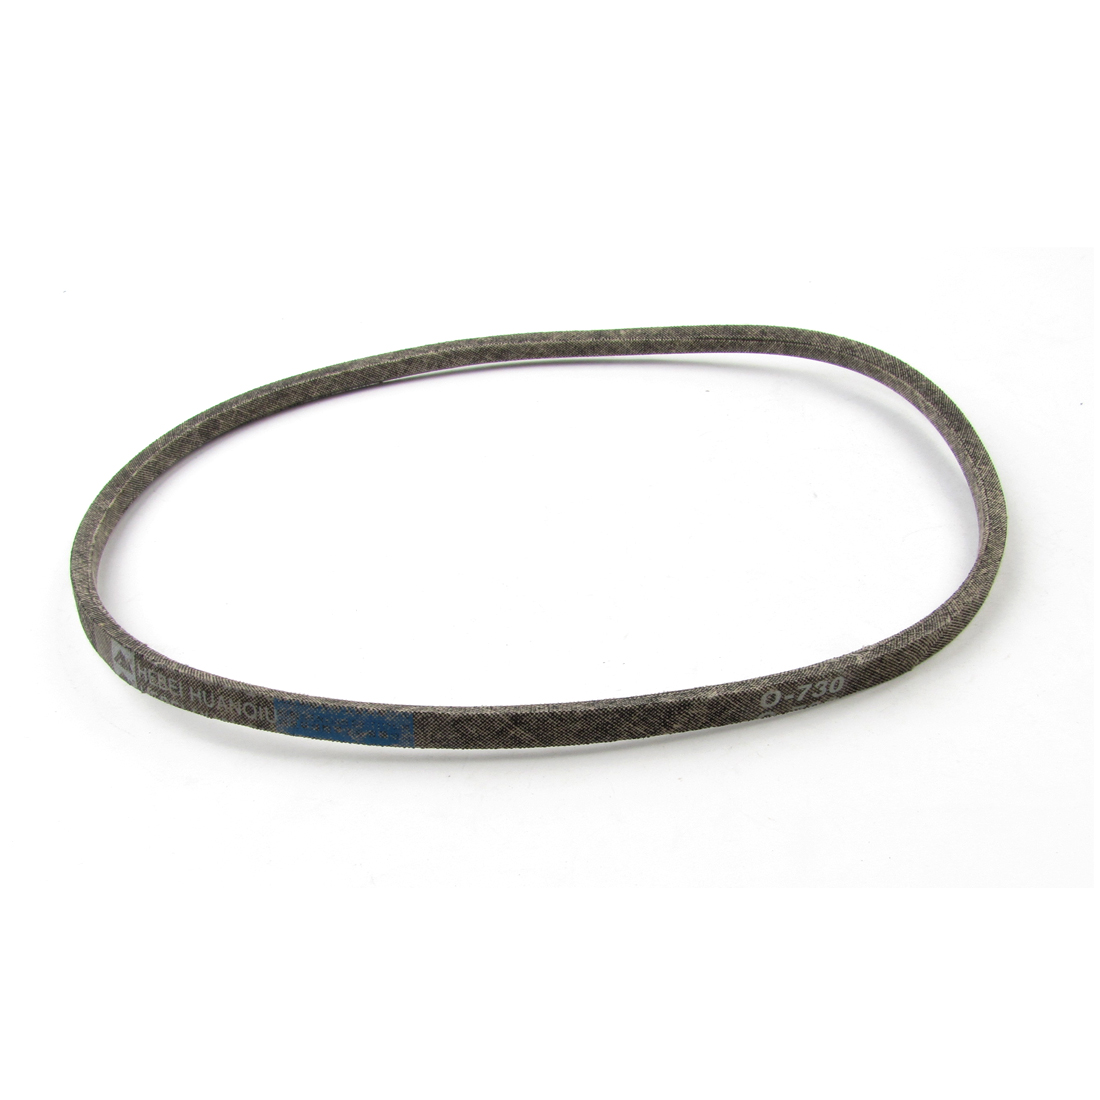 Washing Machine Repair Part 6mm Inner Width 6mm Thickness O-730E Rubber Belt